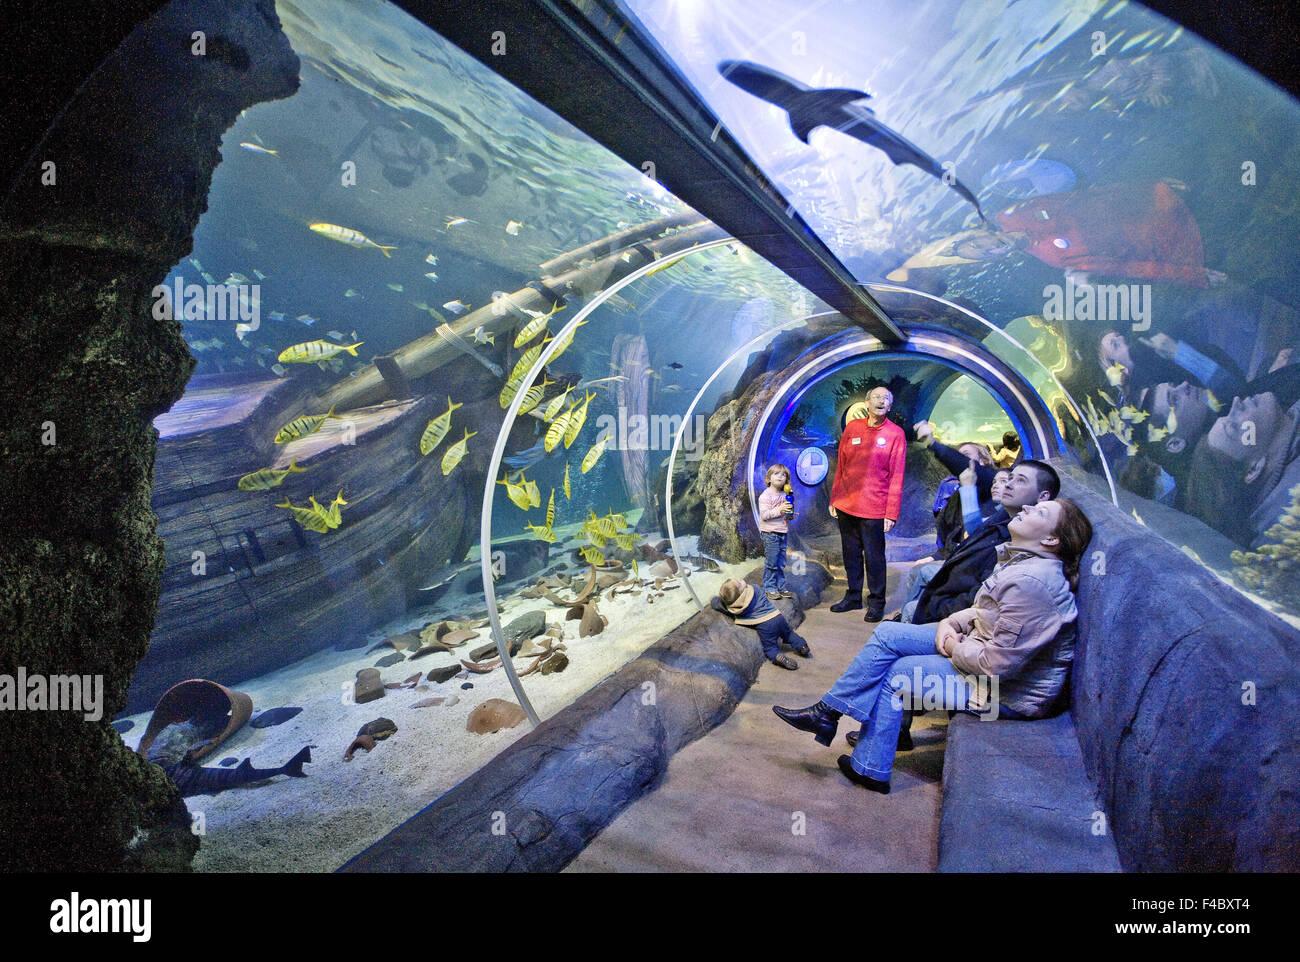 Sea Life Oberhausen, Germany - Stock Image